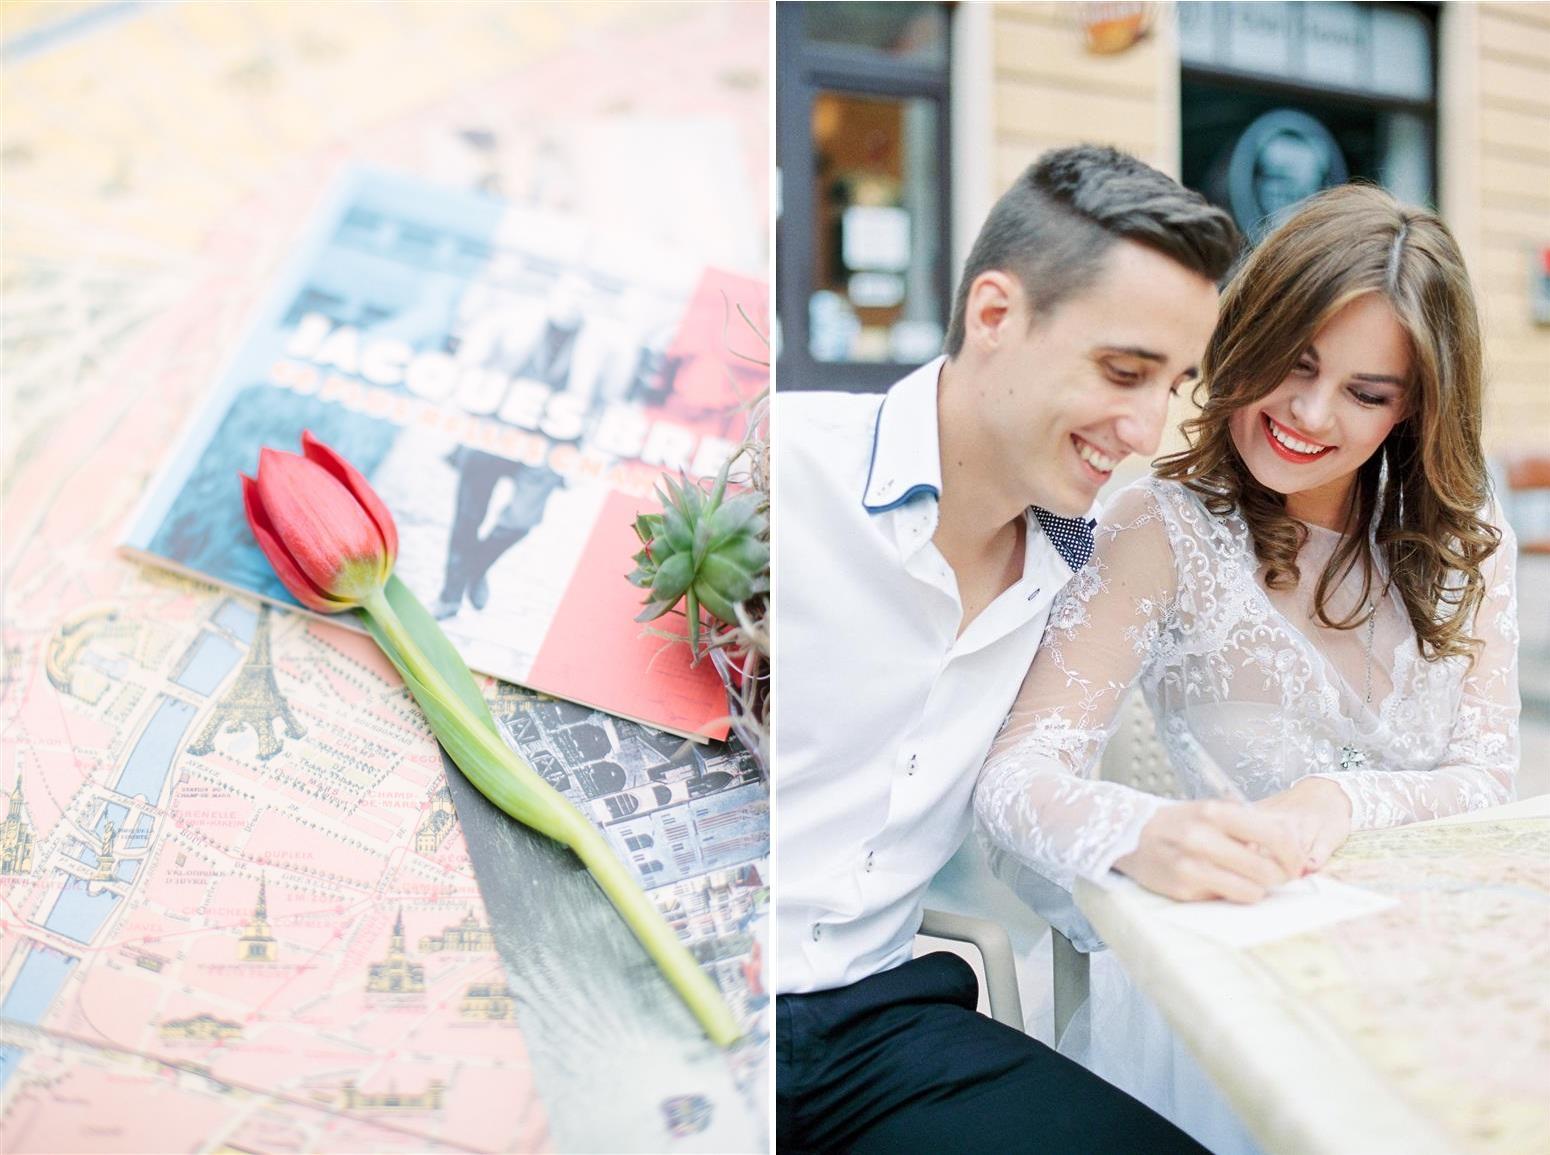 Vespa Love - Valentines Inspiration in Paris